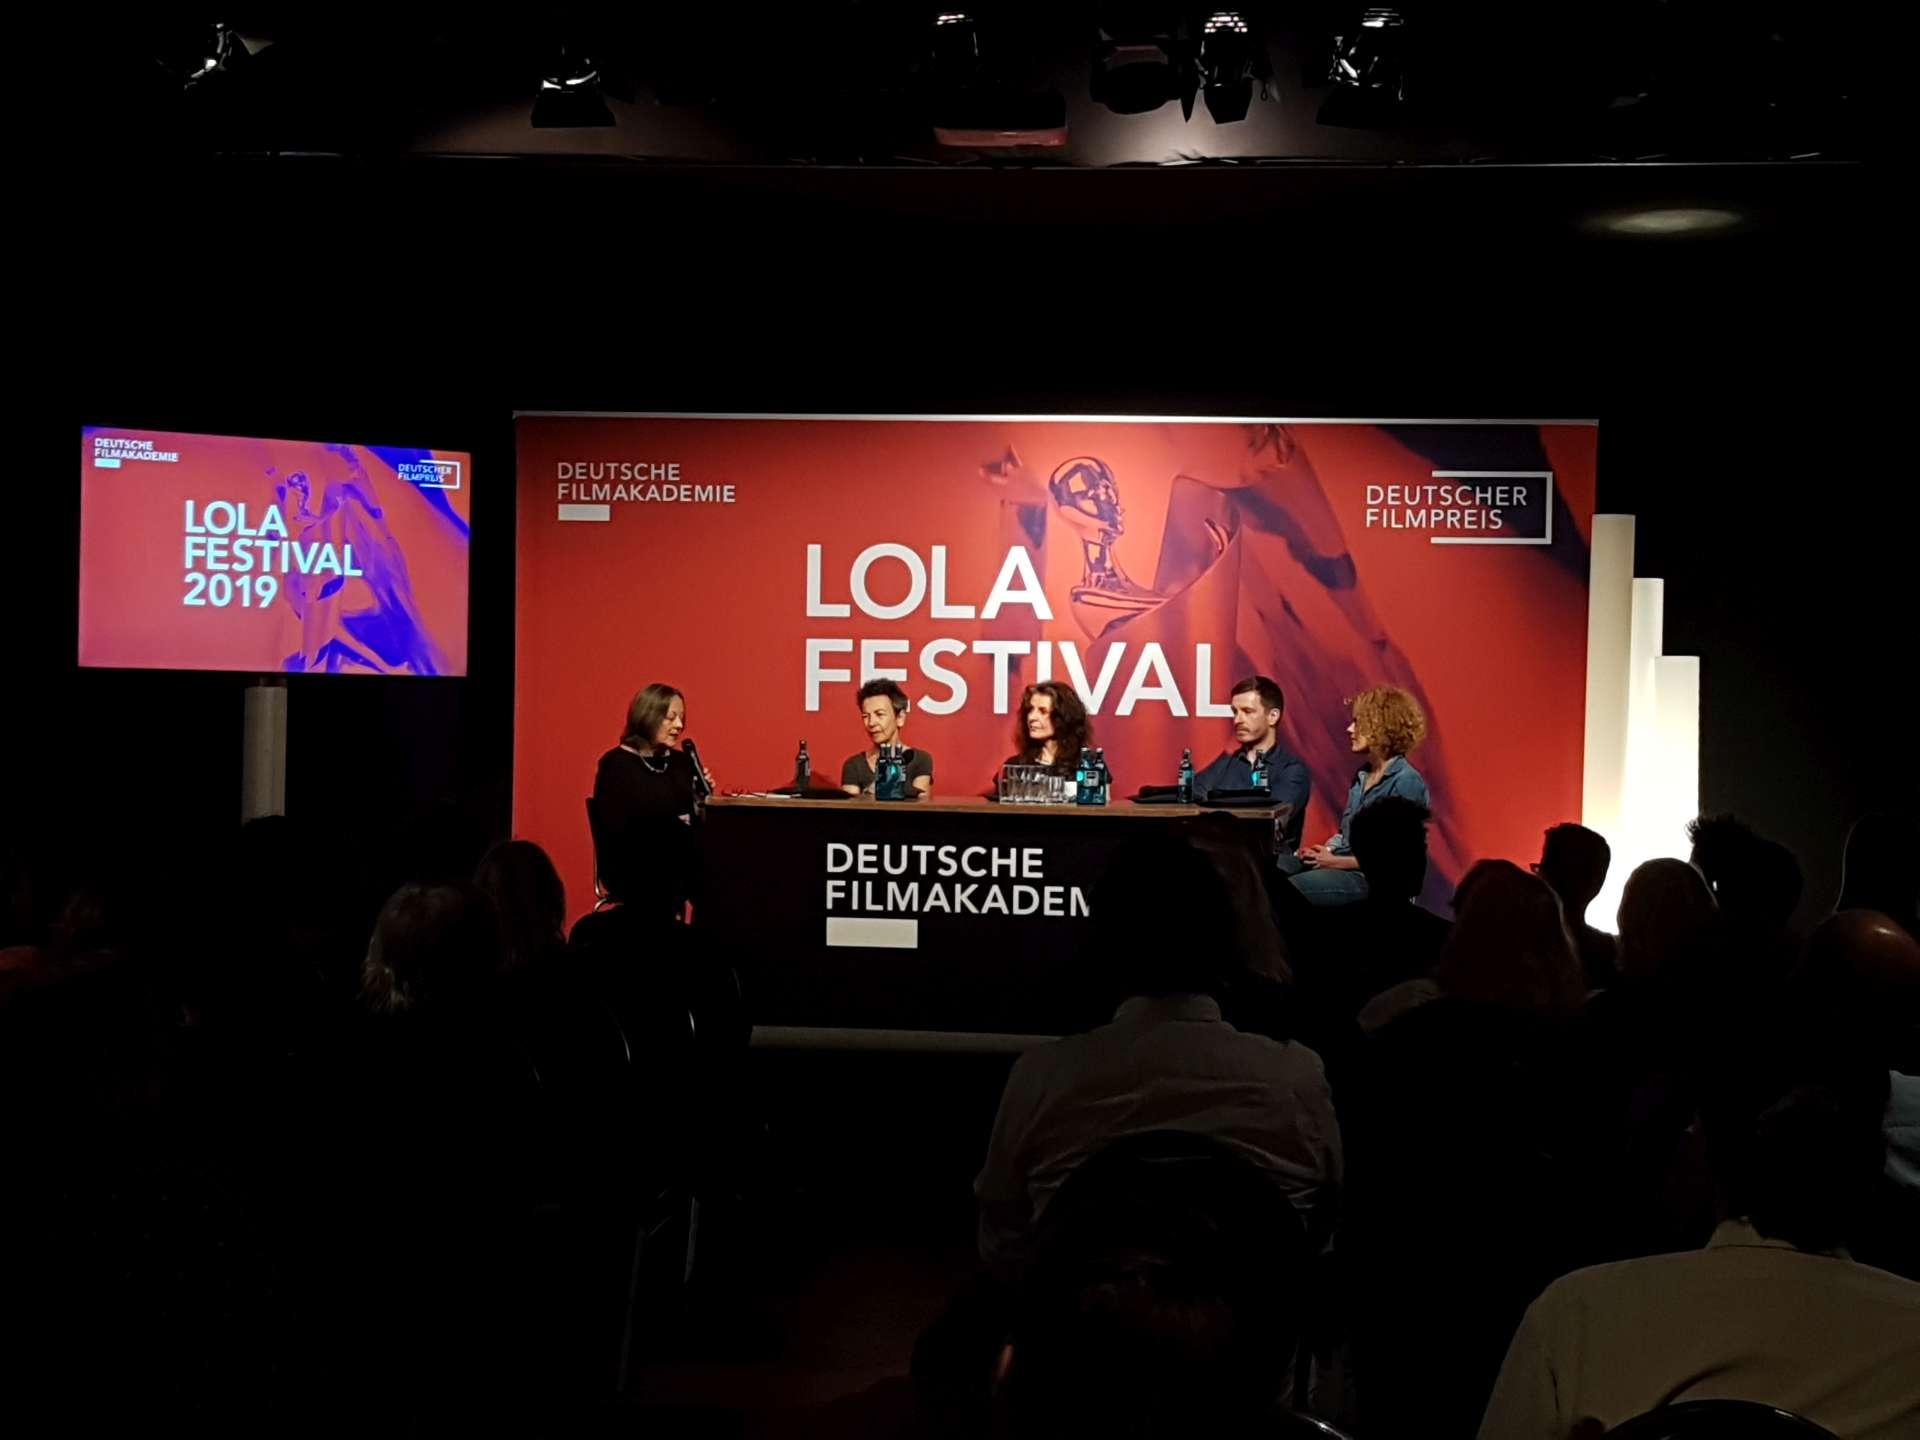 Lola Festival 2019